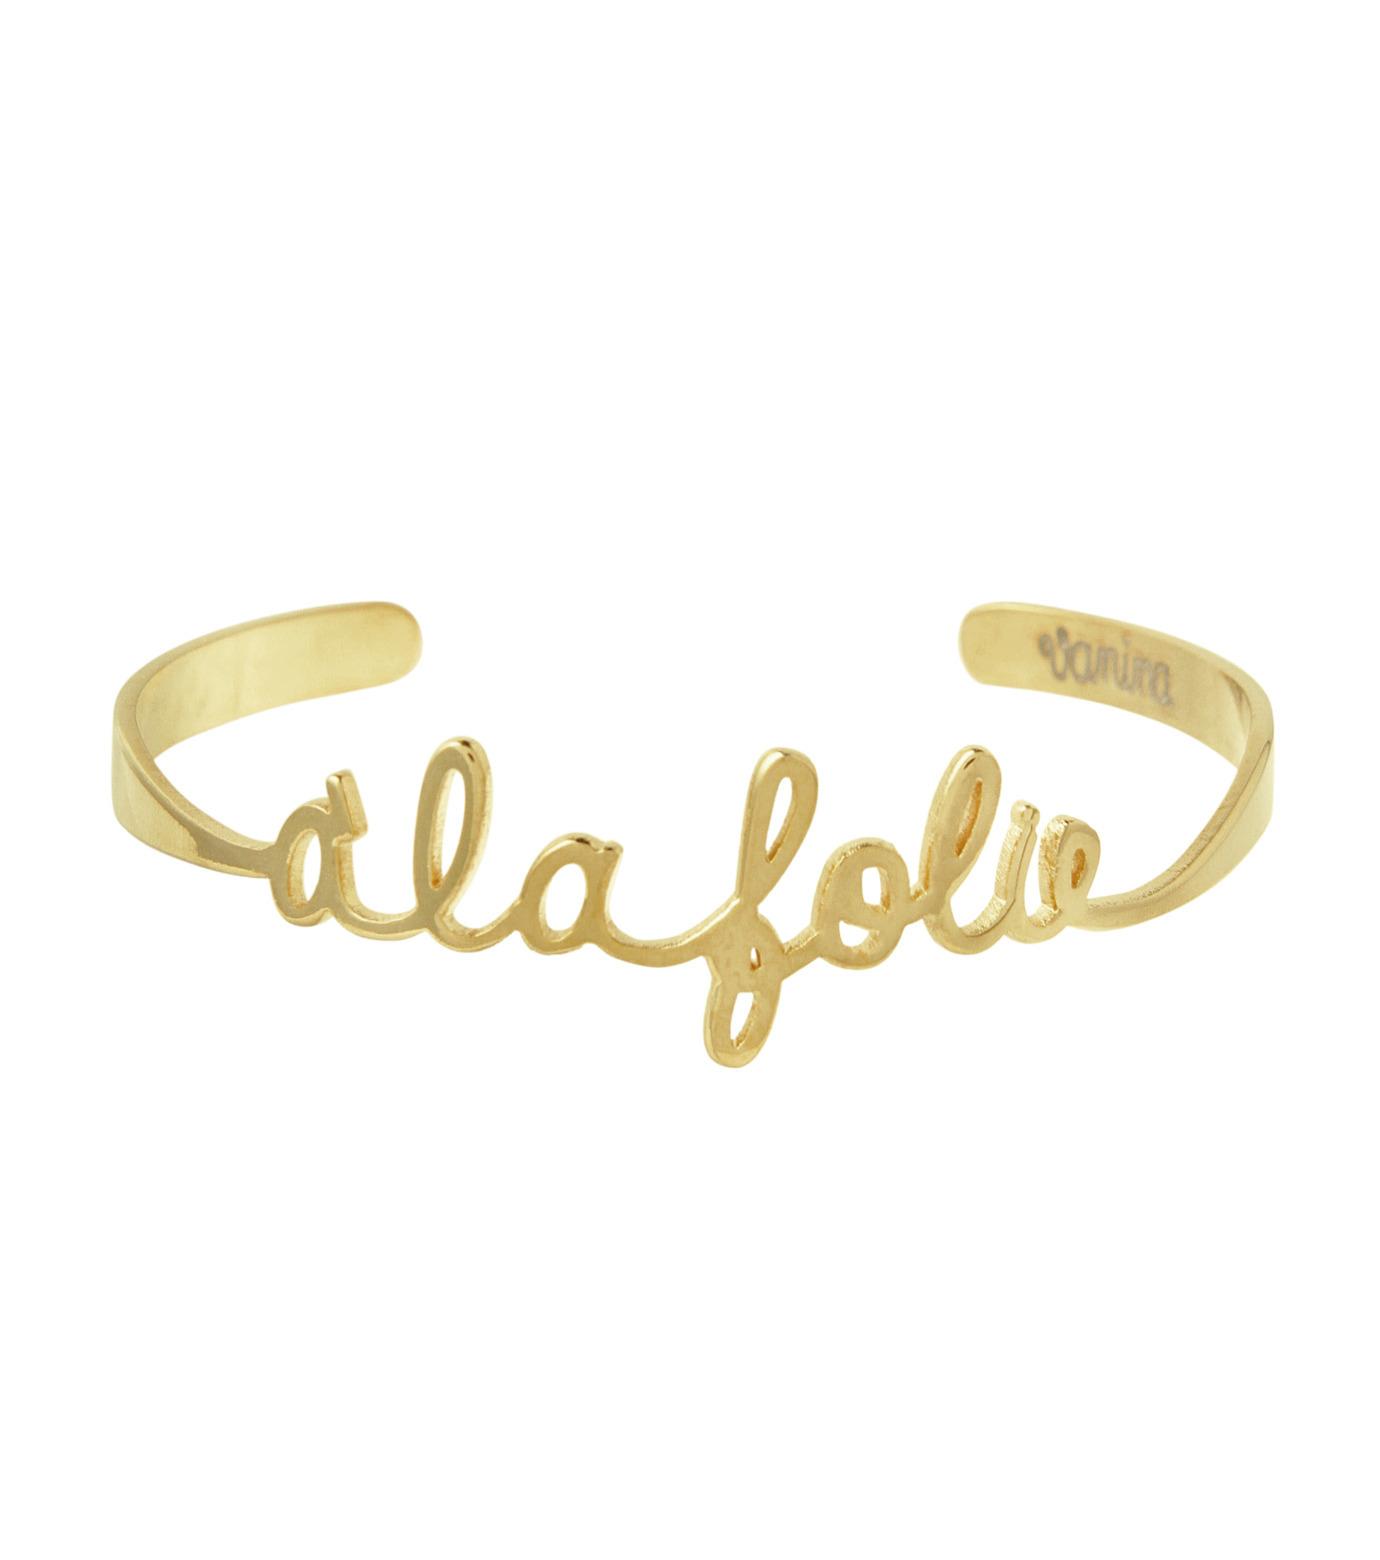 VANINA(バニーナ)のA la folie Bracelet-GOLD(アクセサリー/accessory)-AMOUR-Foli-L 拡大詳細画像1